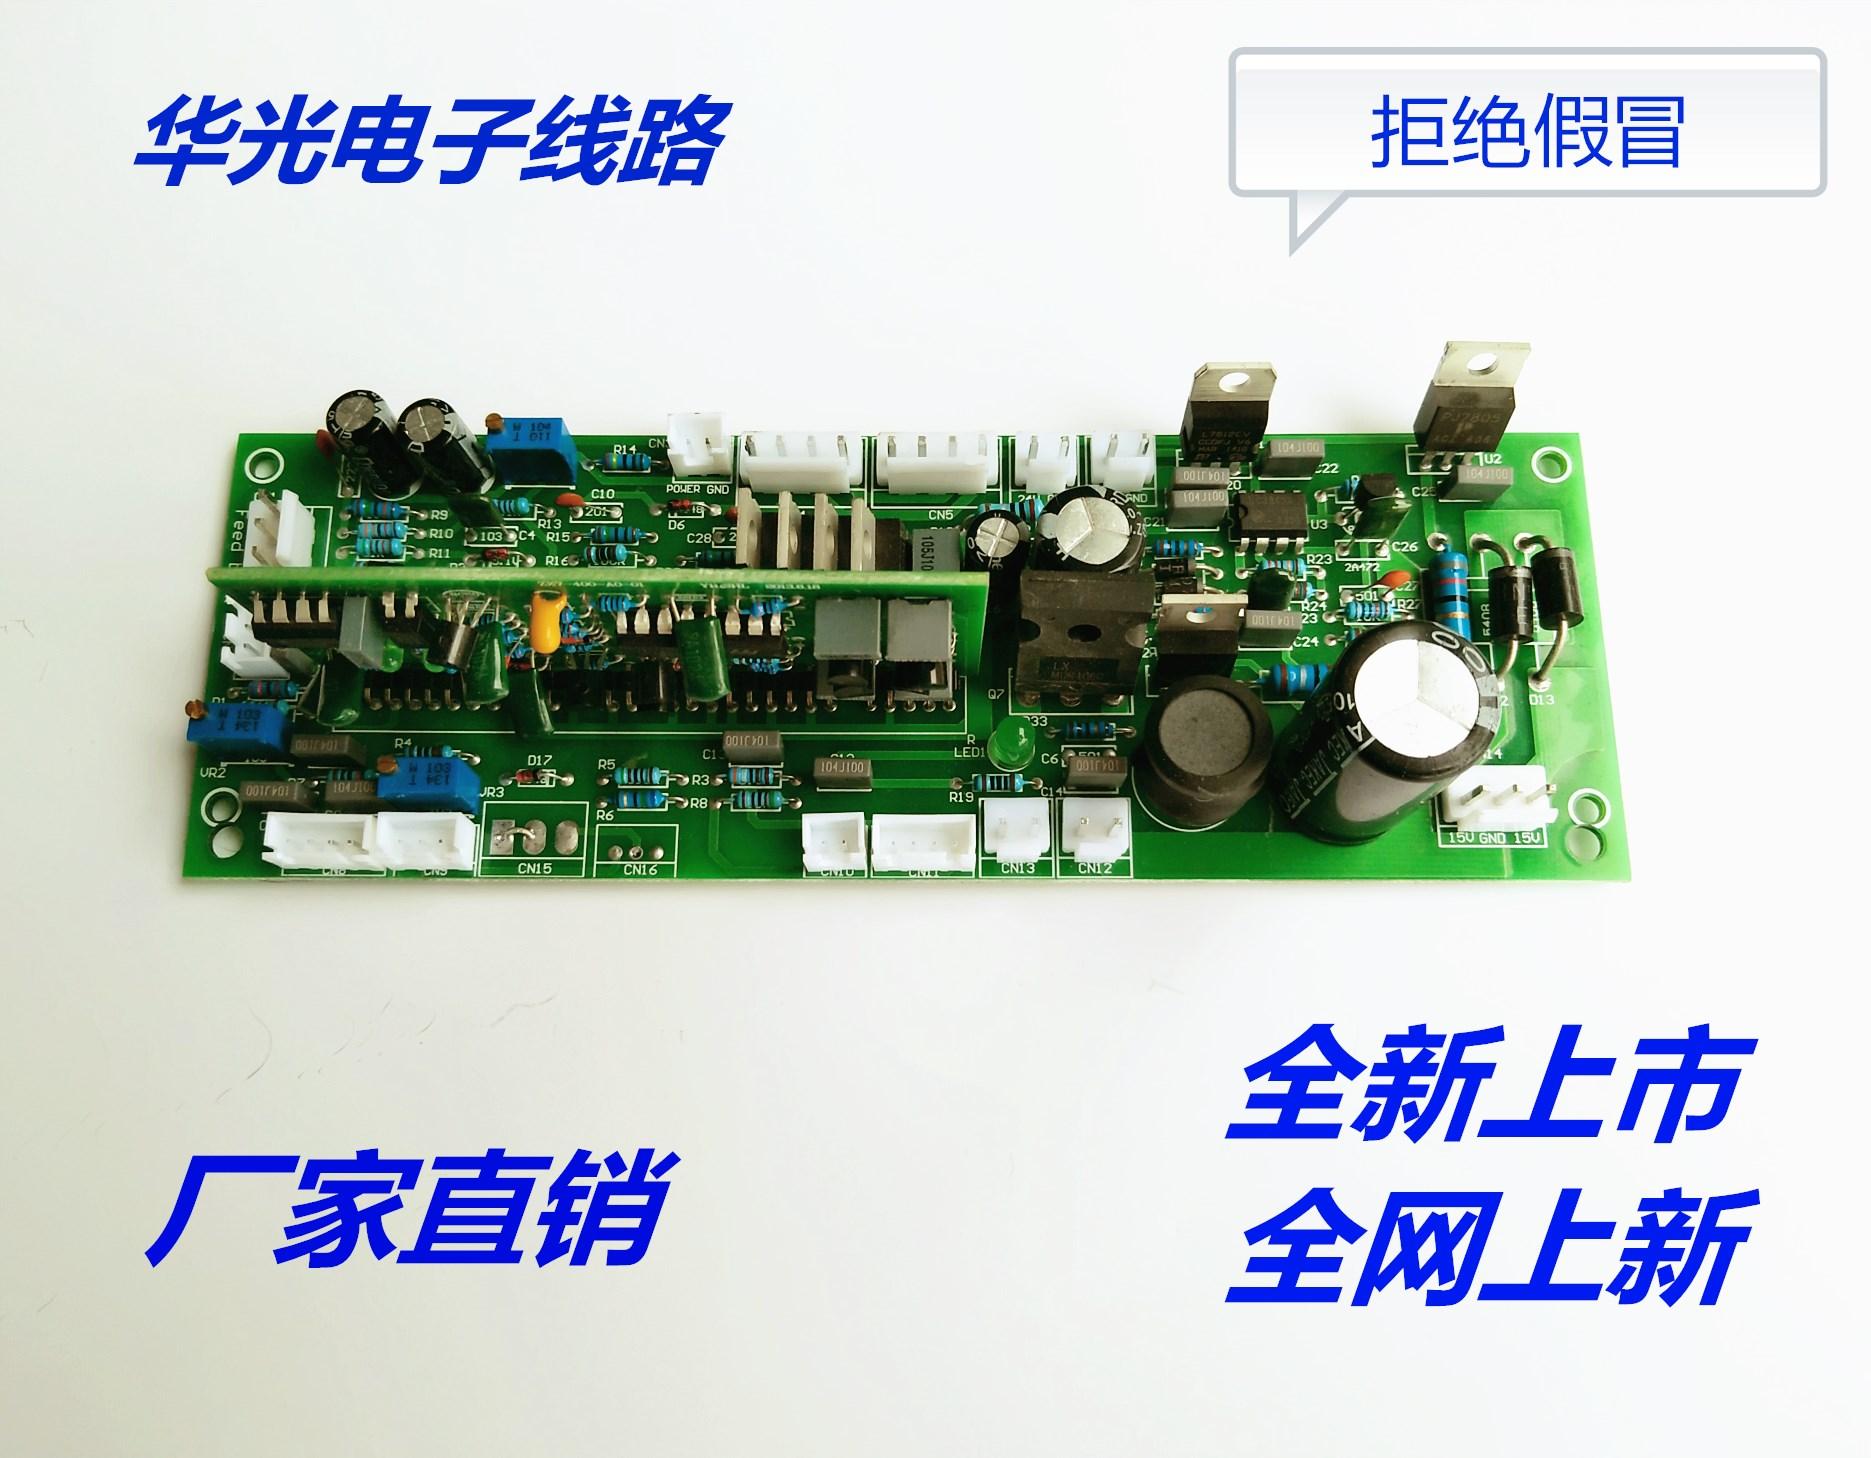 Ruiling welding machine inverter DC accessories TIG welding ZX7315 MOS tube  welding machine circuit board strip board